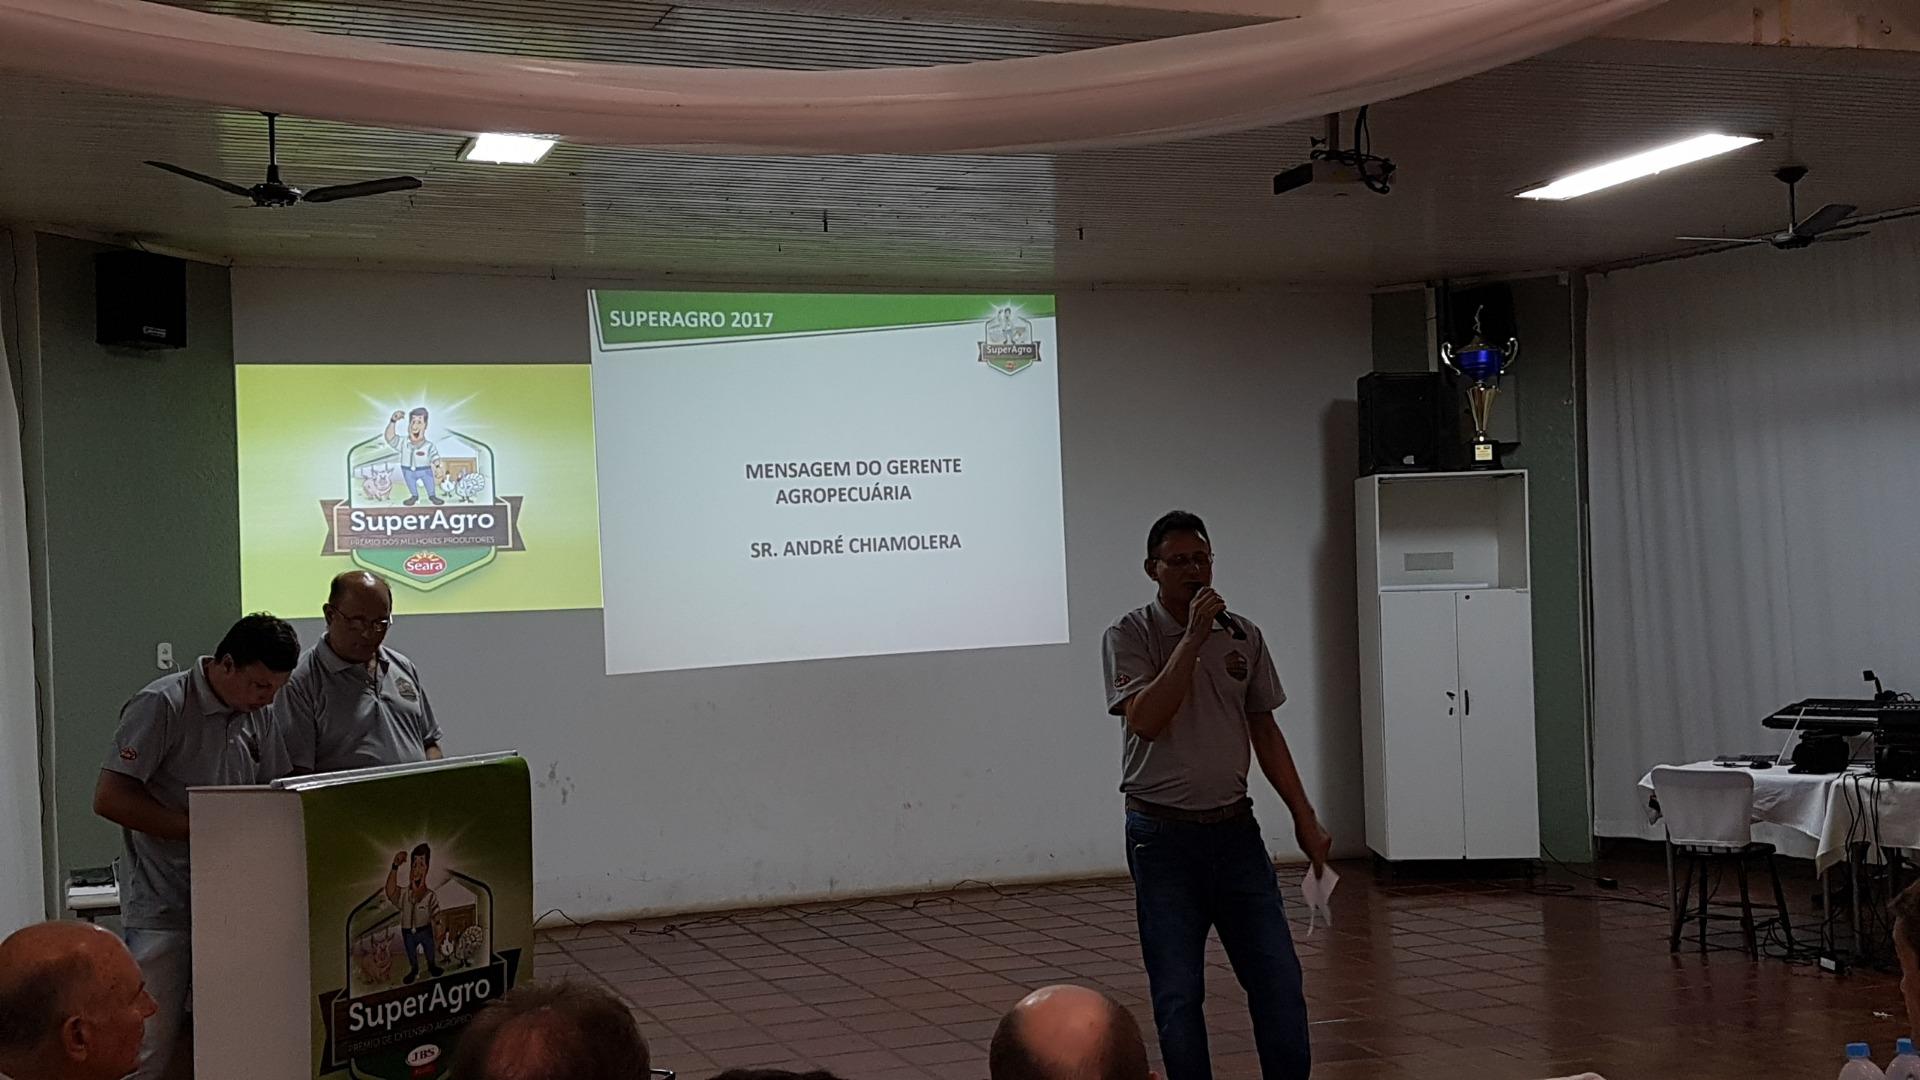 Seara de Itapiranga promove SuperAgro e distribui R$ 45 mil em prêmios